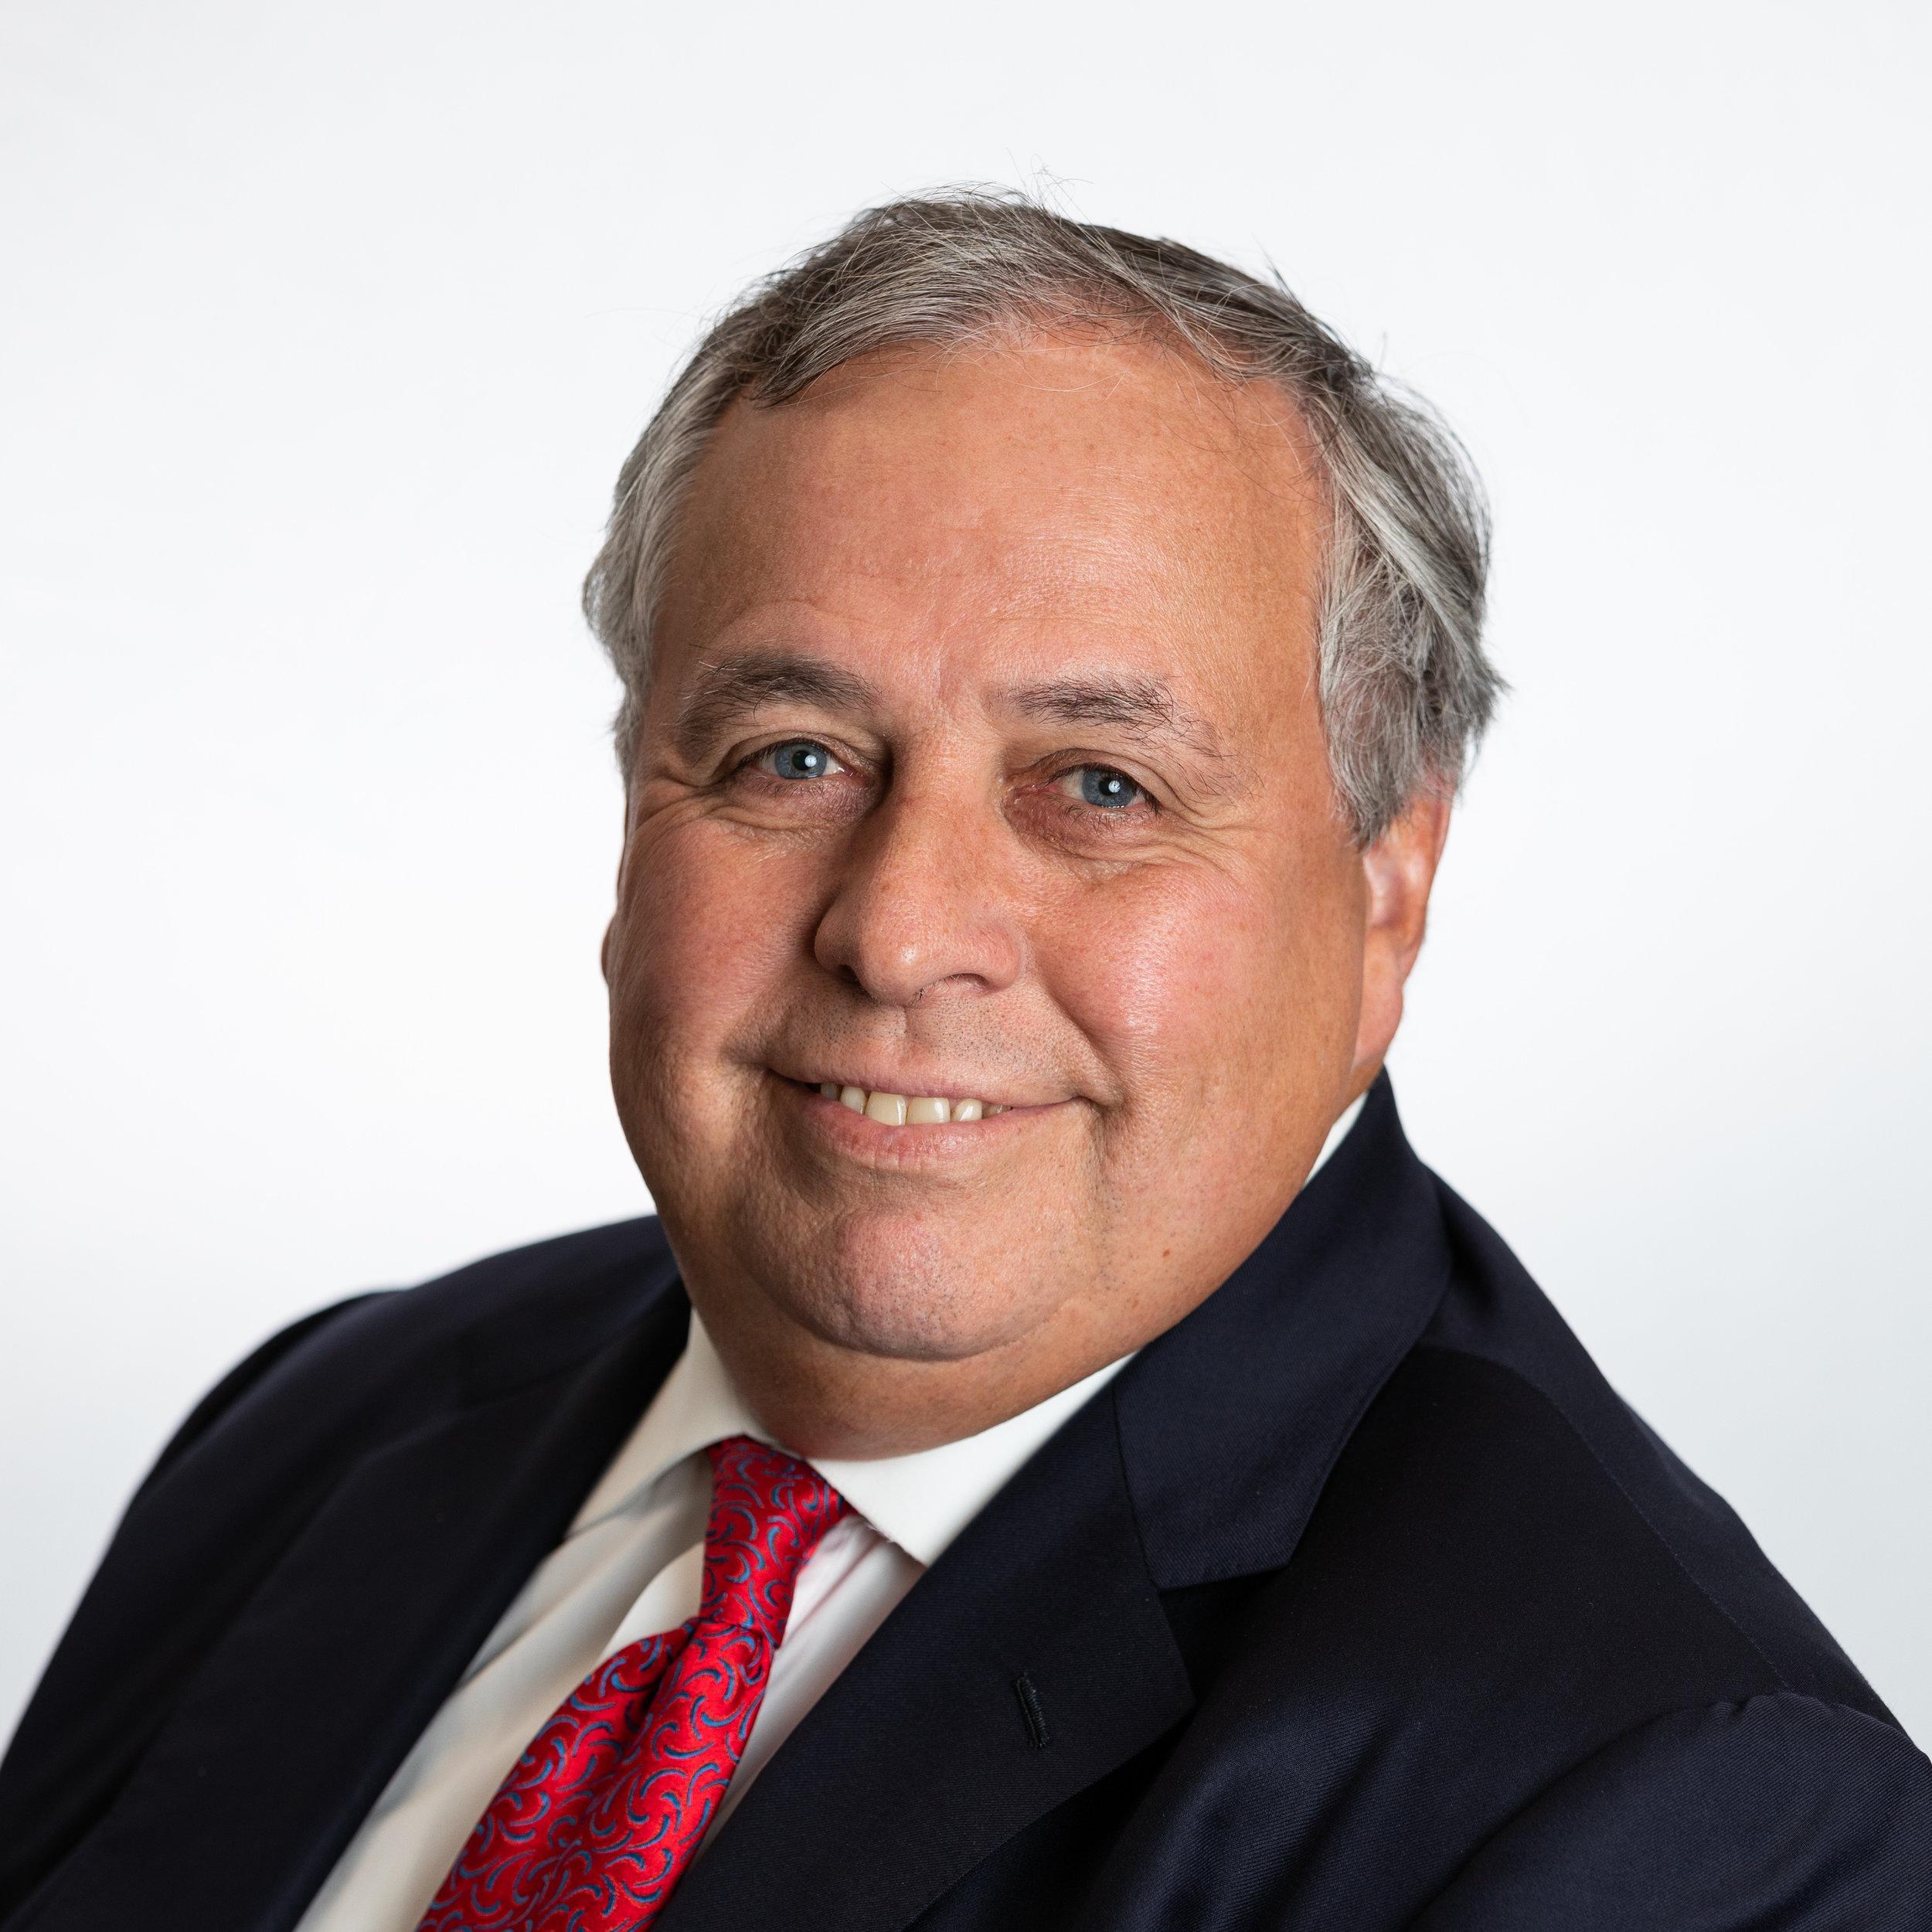 Joseph B. Ryan, Jr. - VICE PRESIDENT